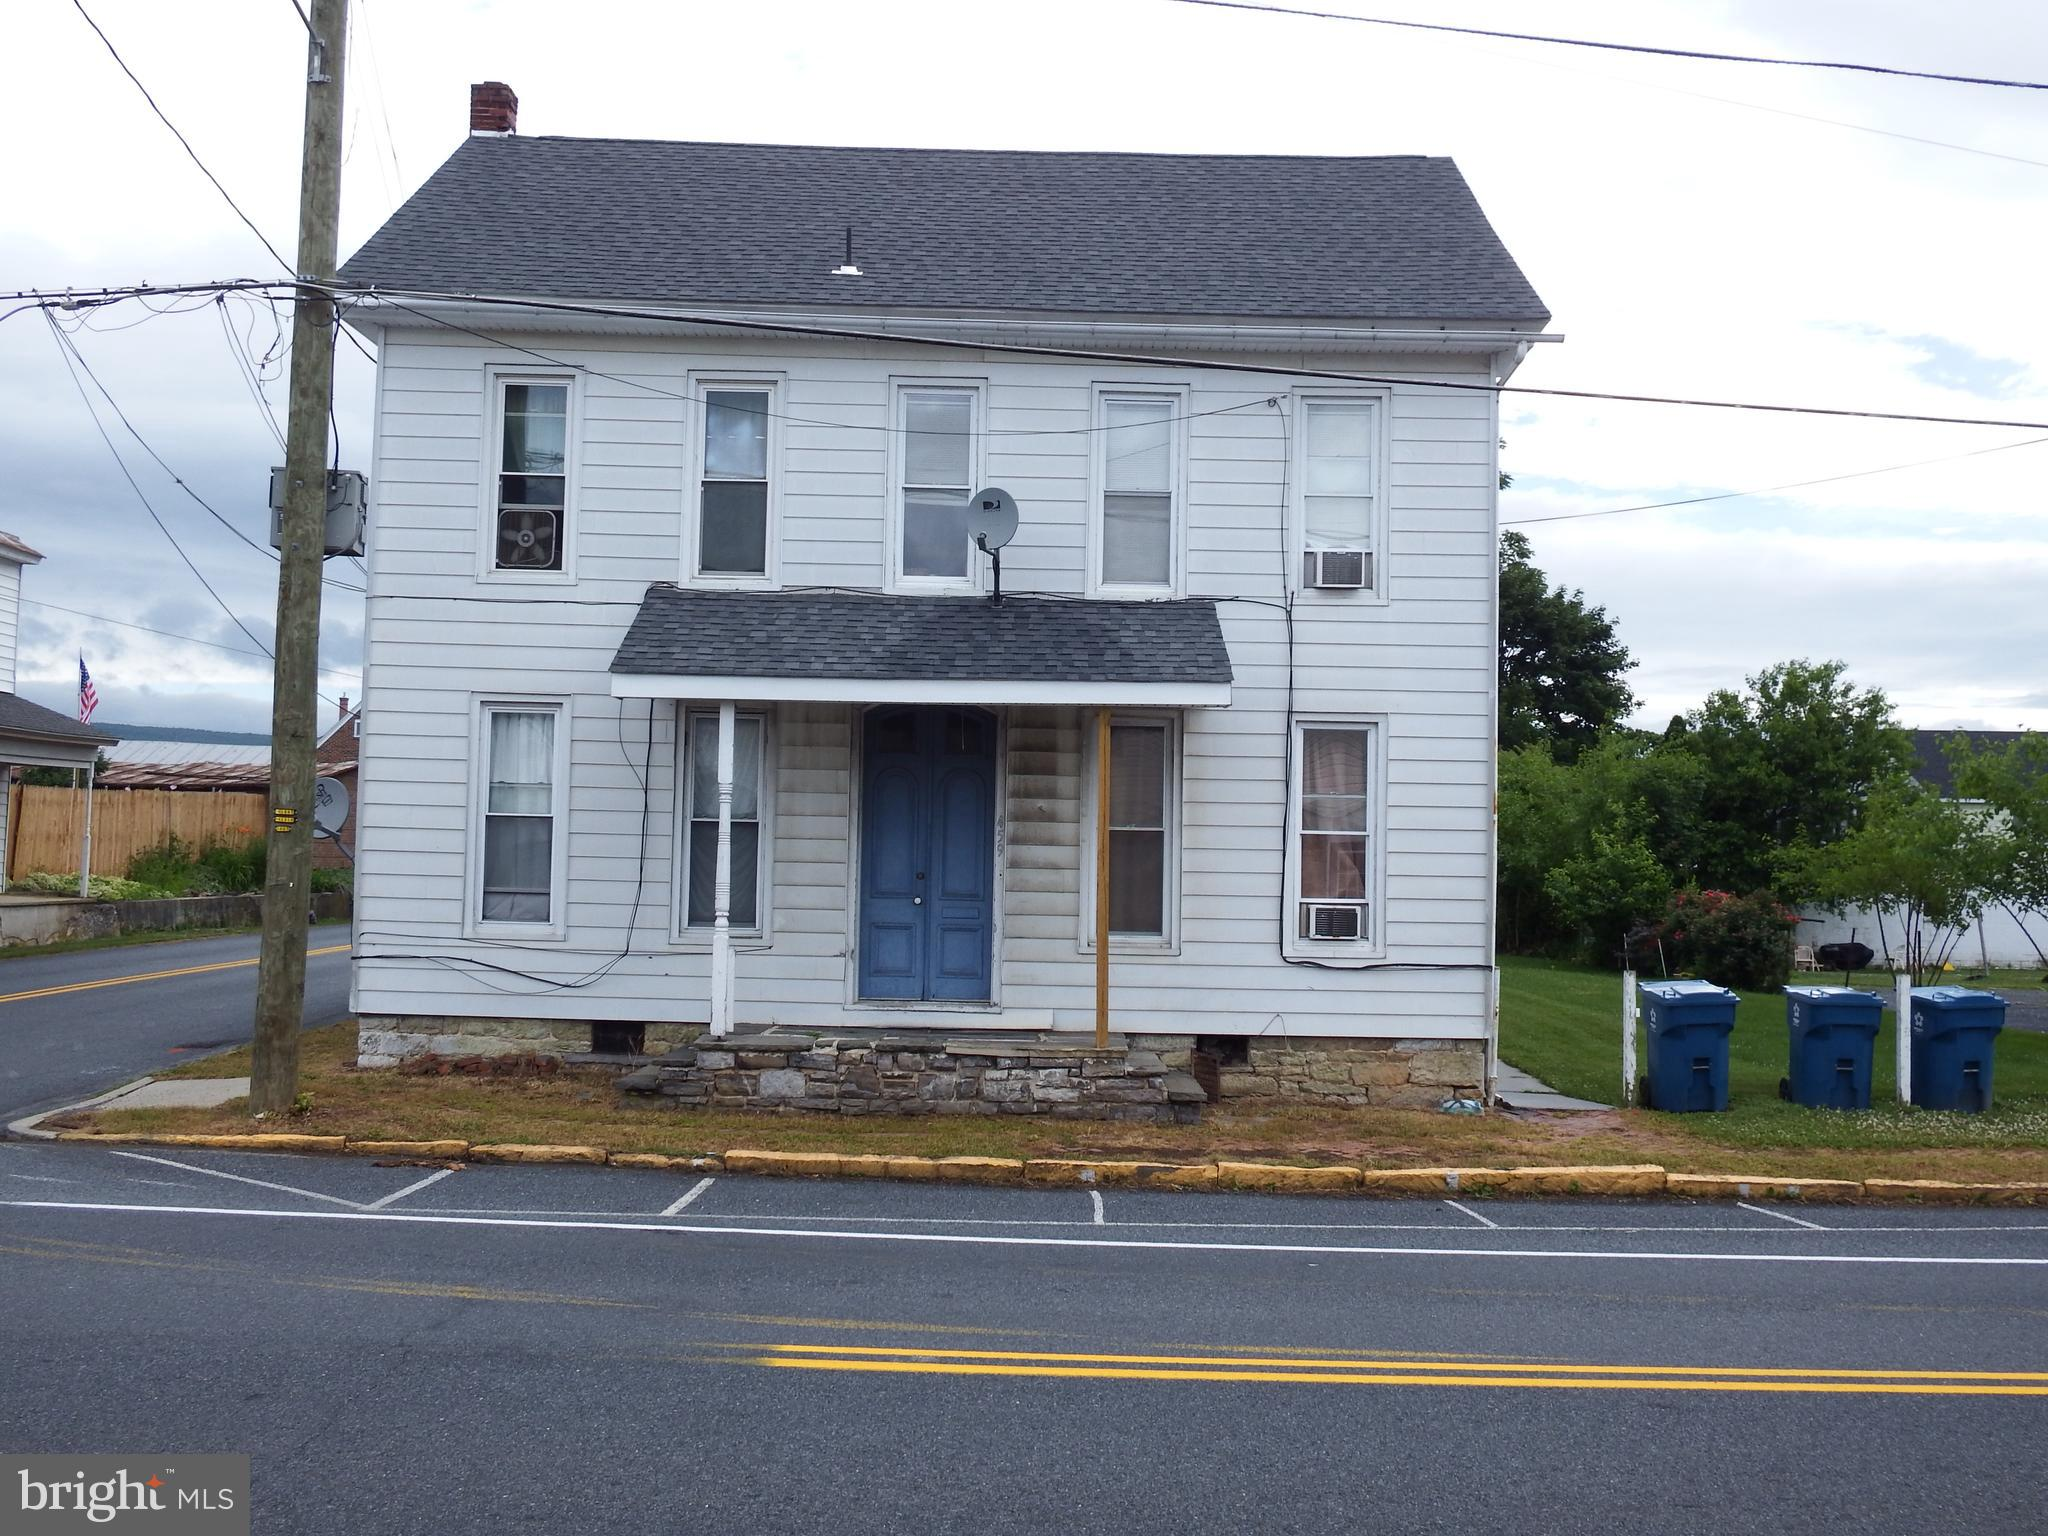 459 GODFREY STREET, BETHEL, PA 19507